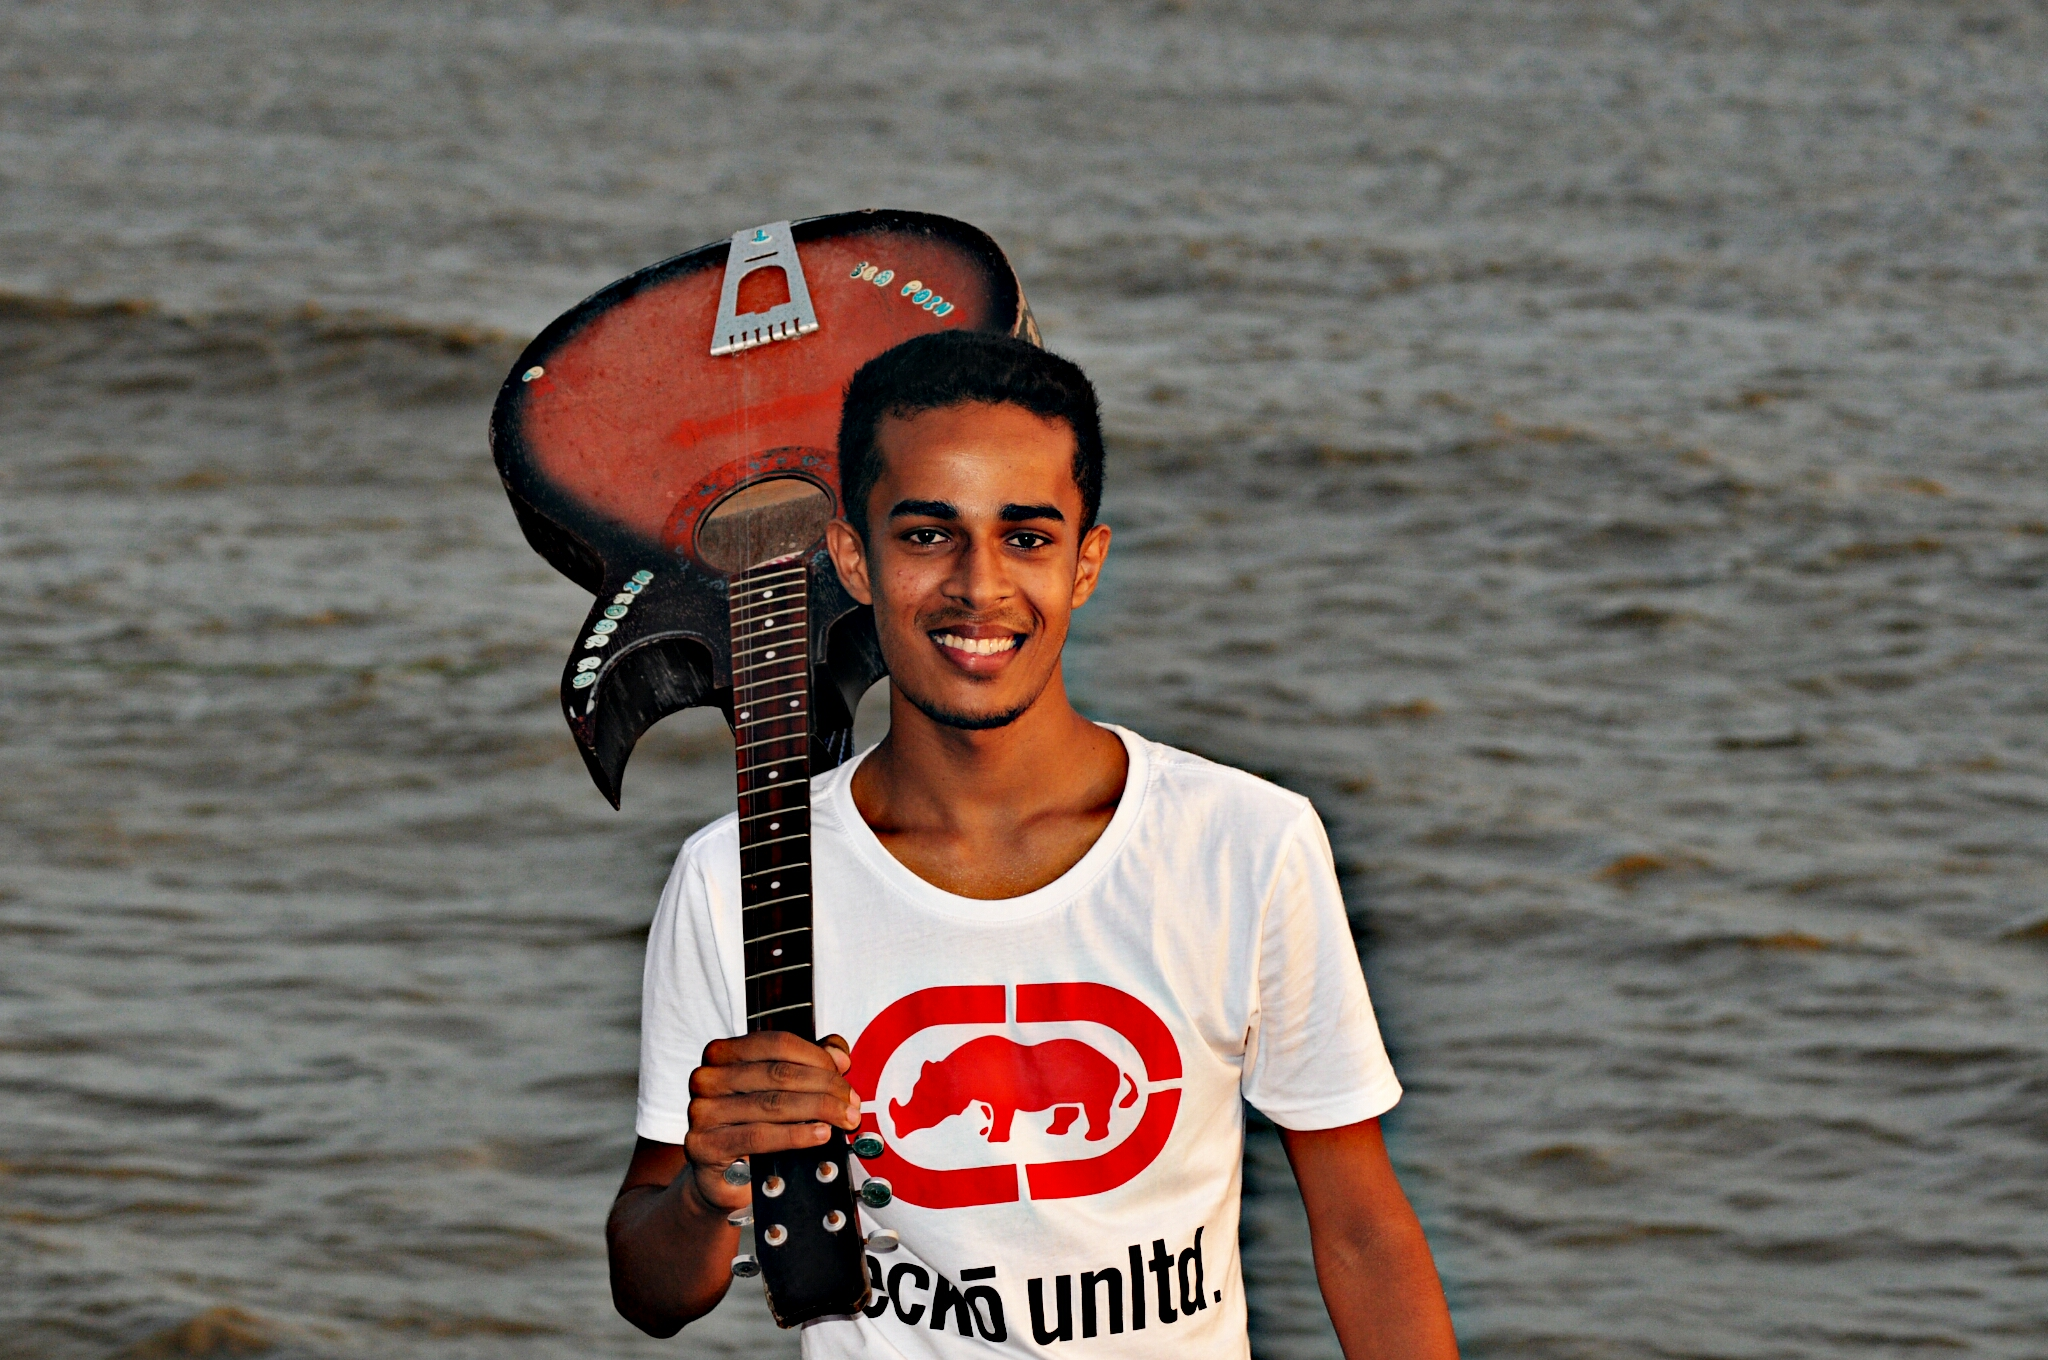 Khaled Hasan